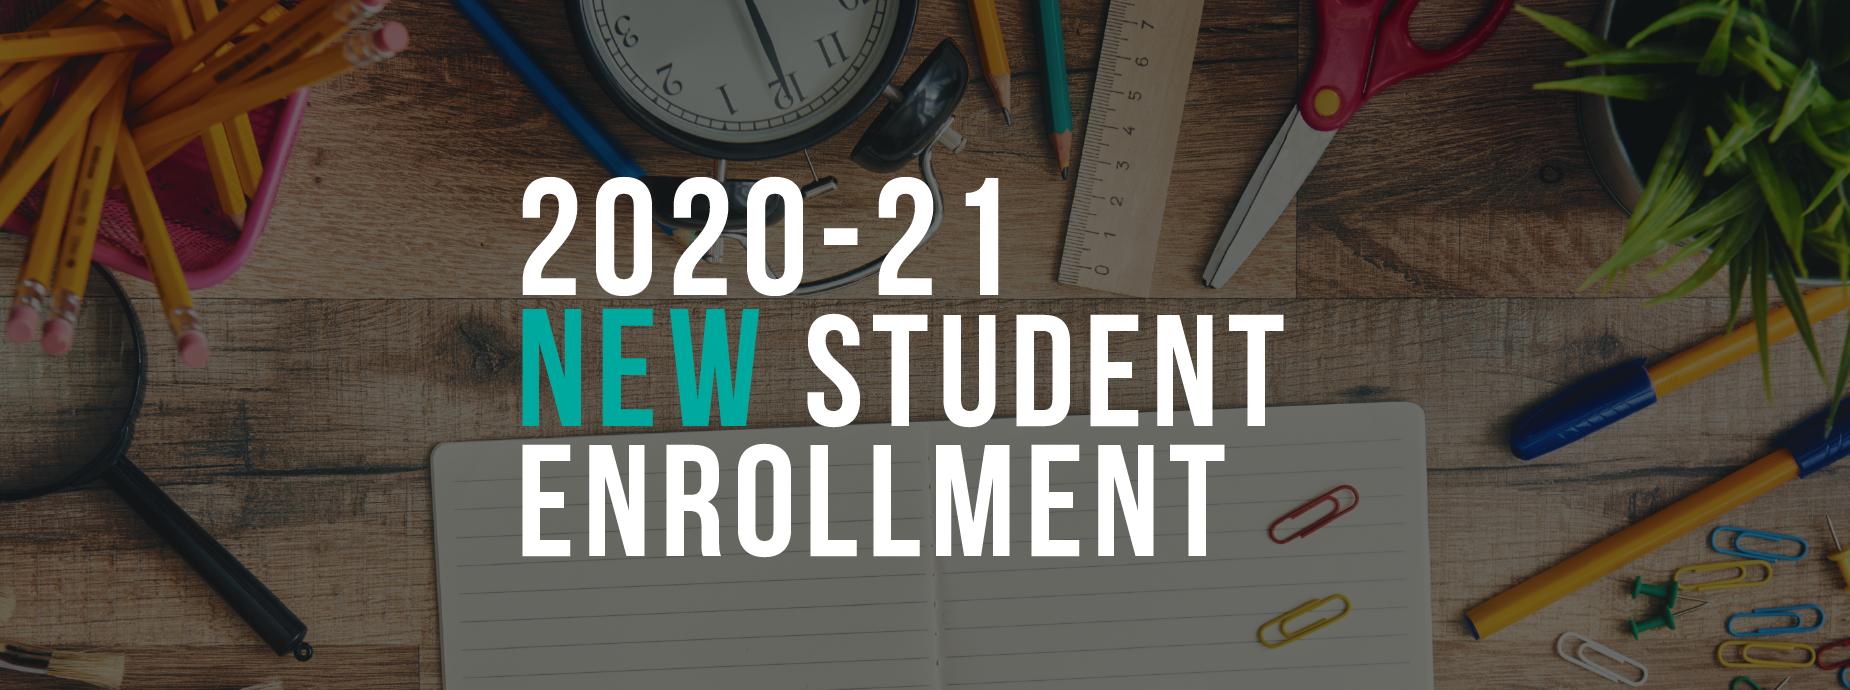 2020-21 New Student Enrollment